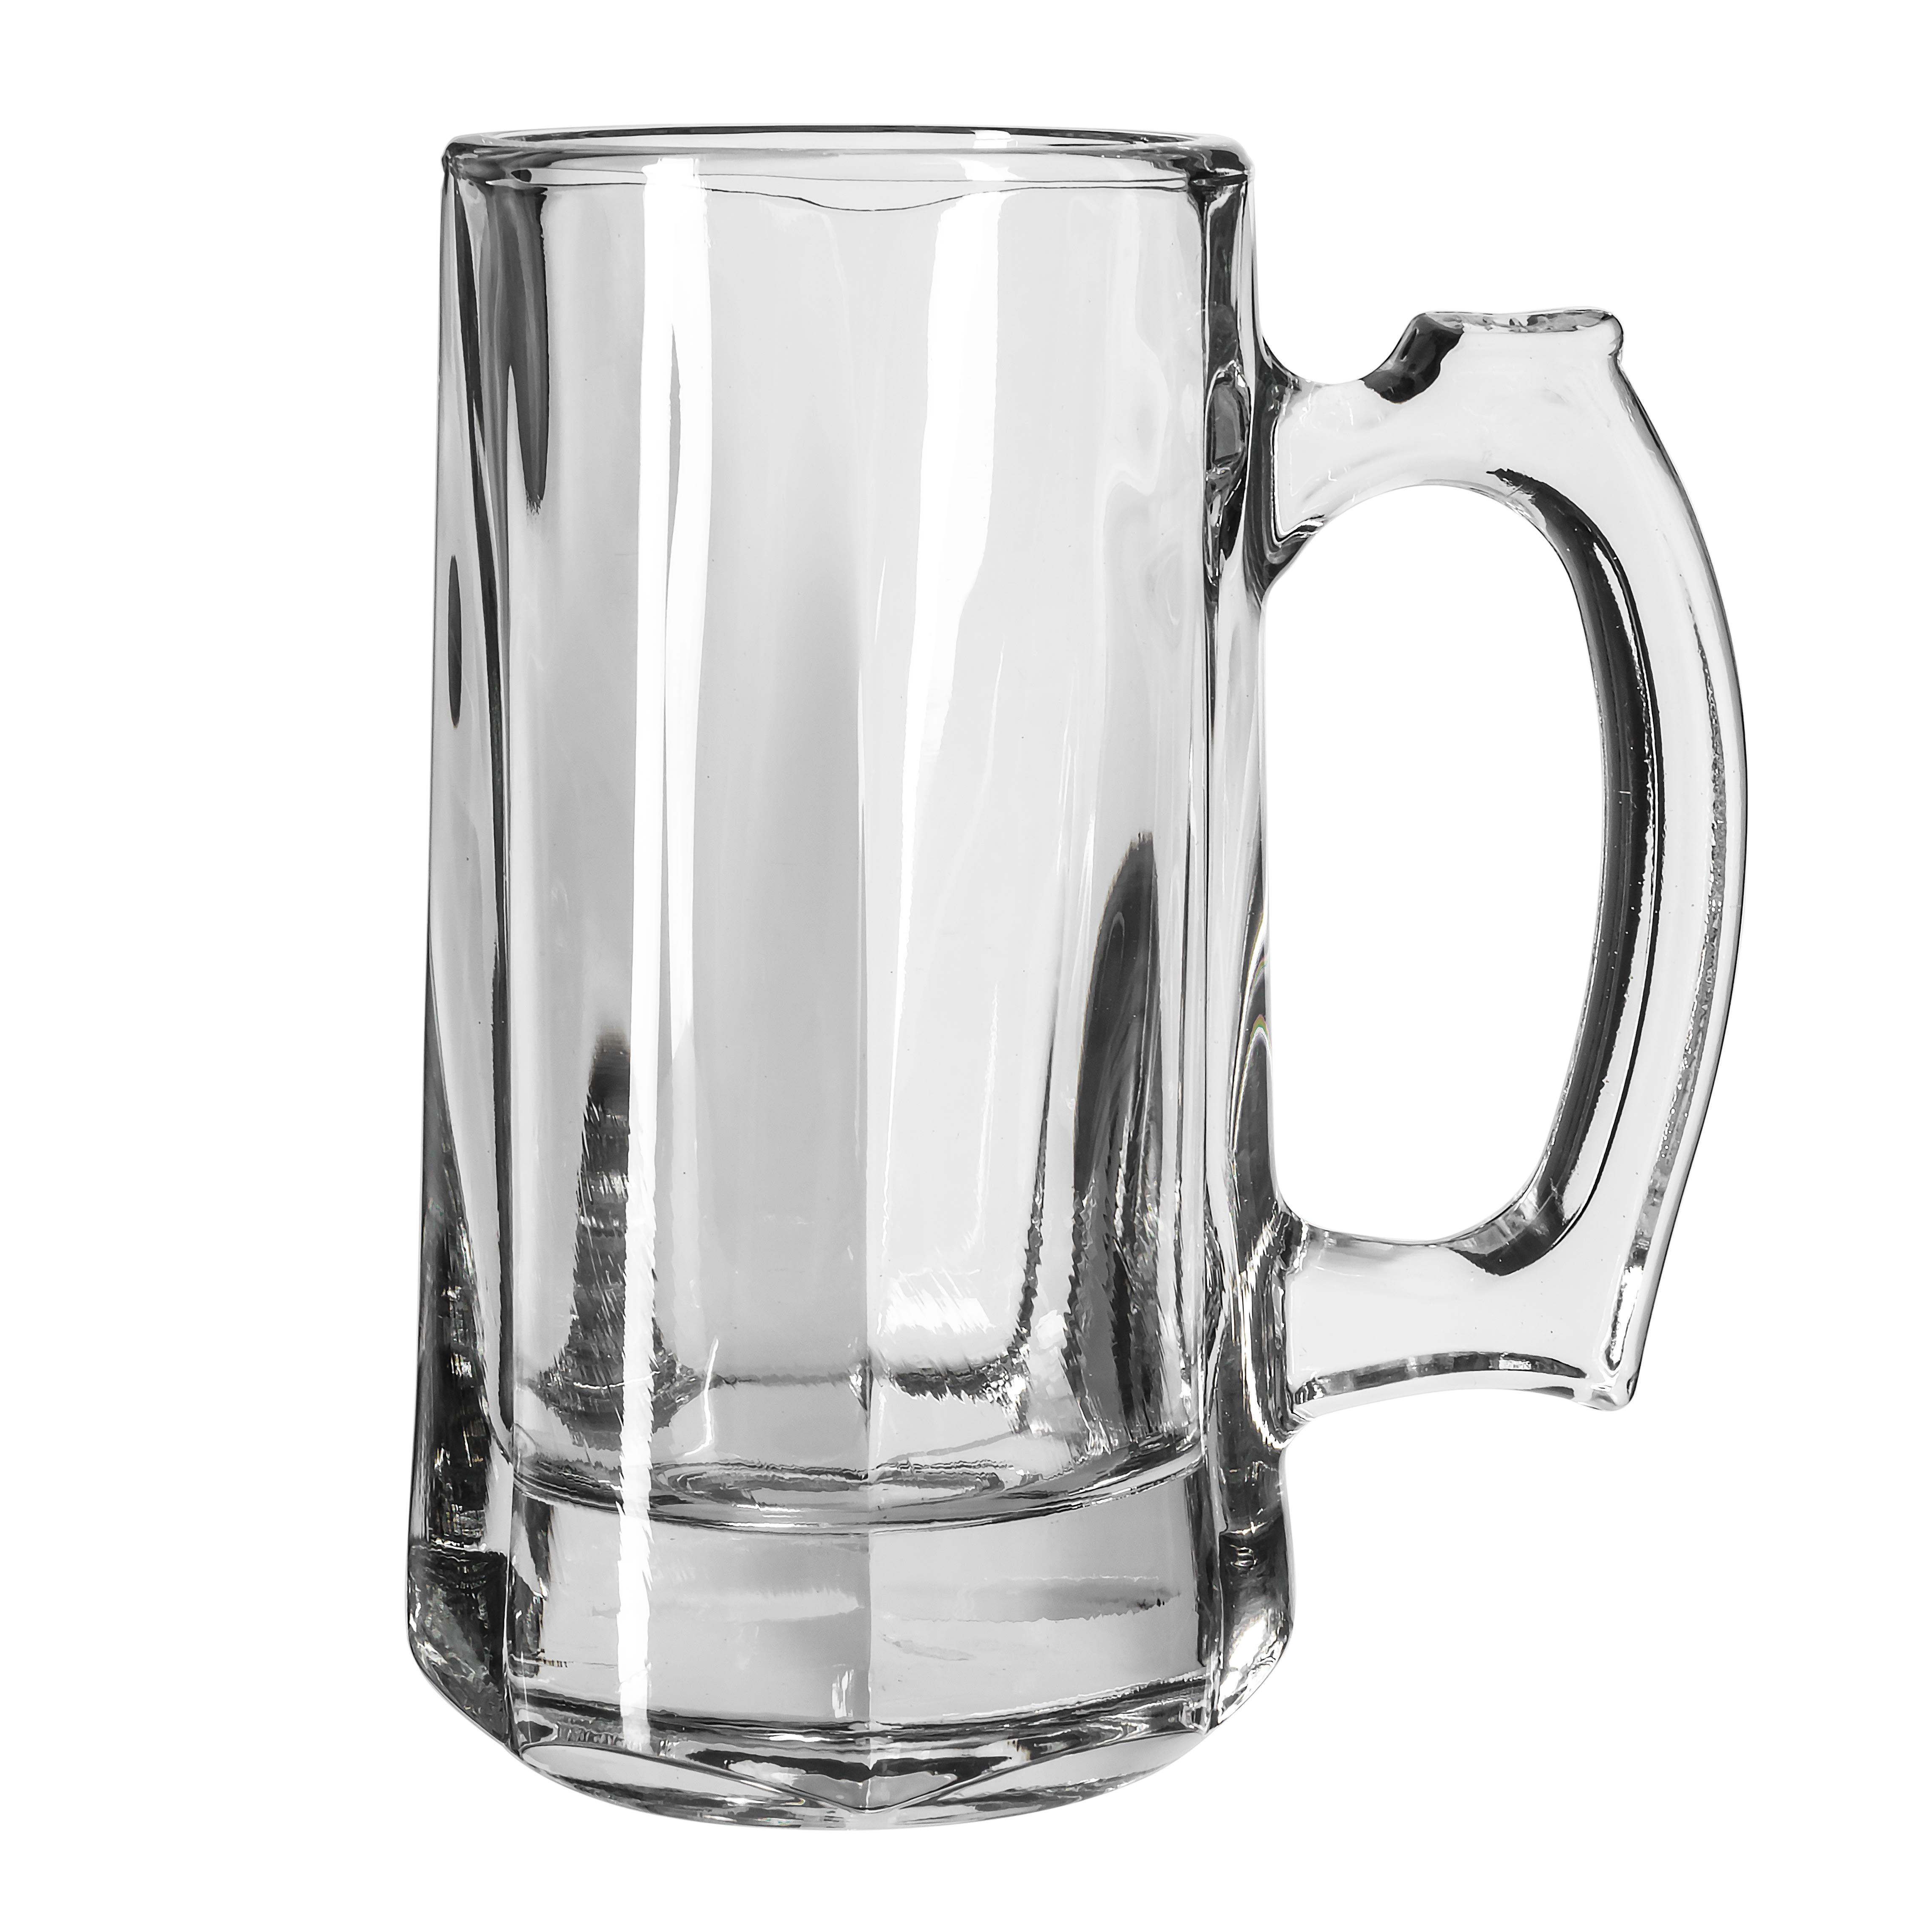 Libbey 5206 12 oz Glass Beer Mug / Stein